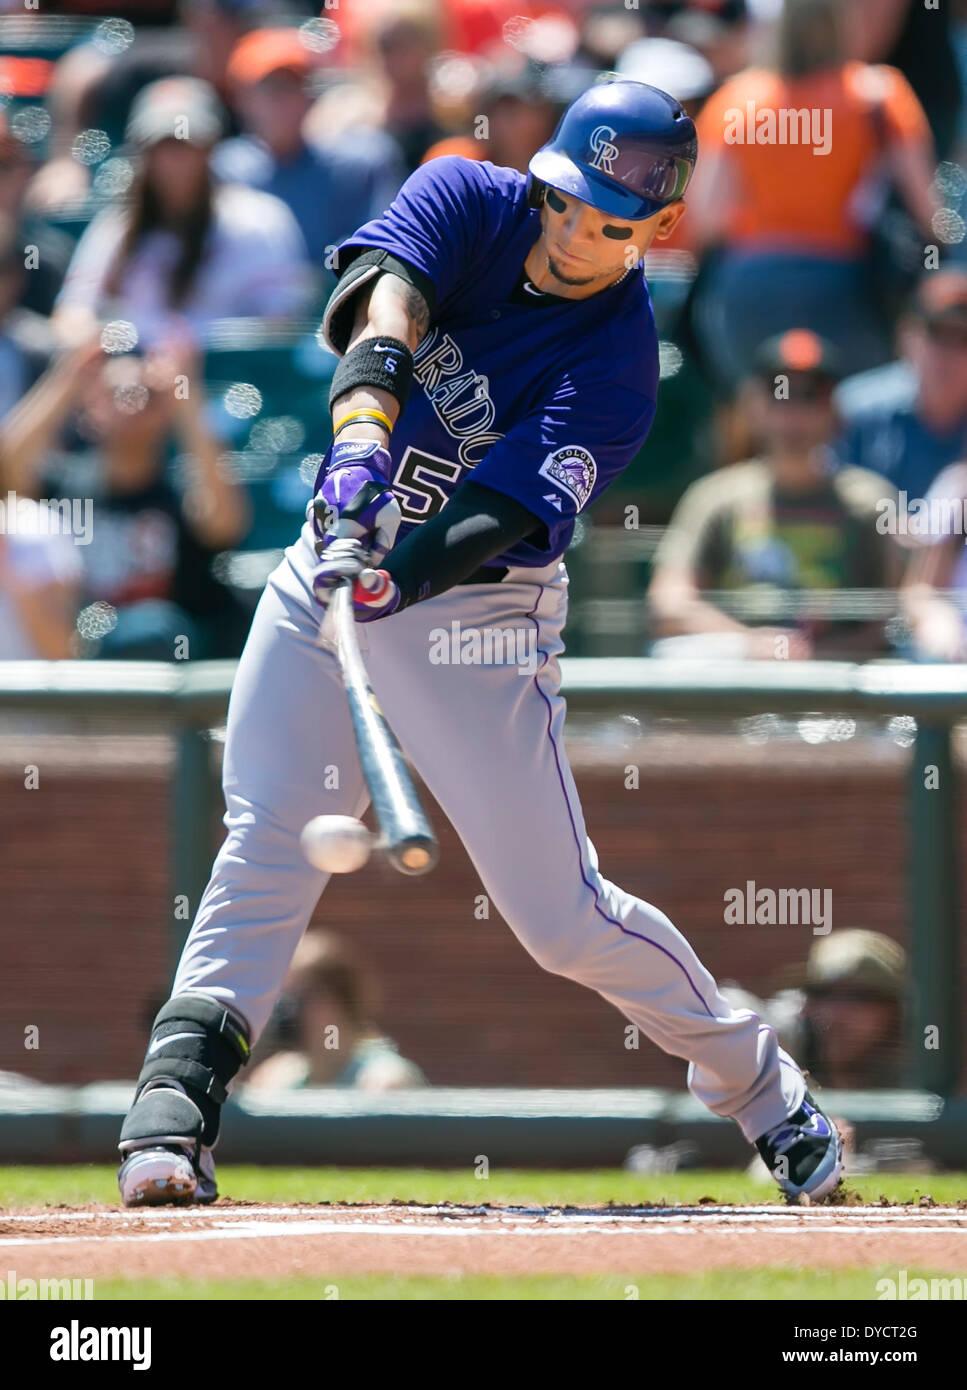 Carlos Gonzalez Rockies Batting